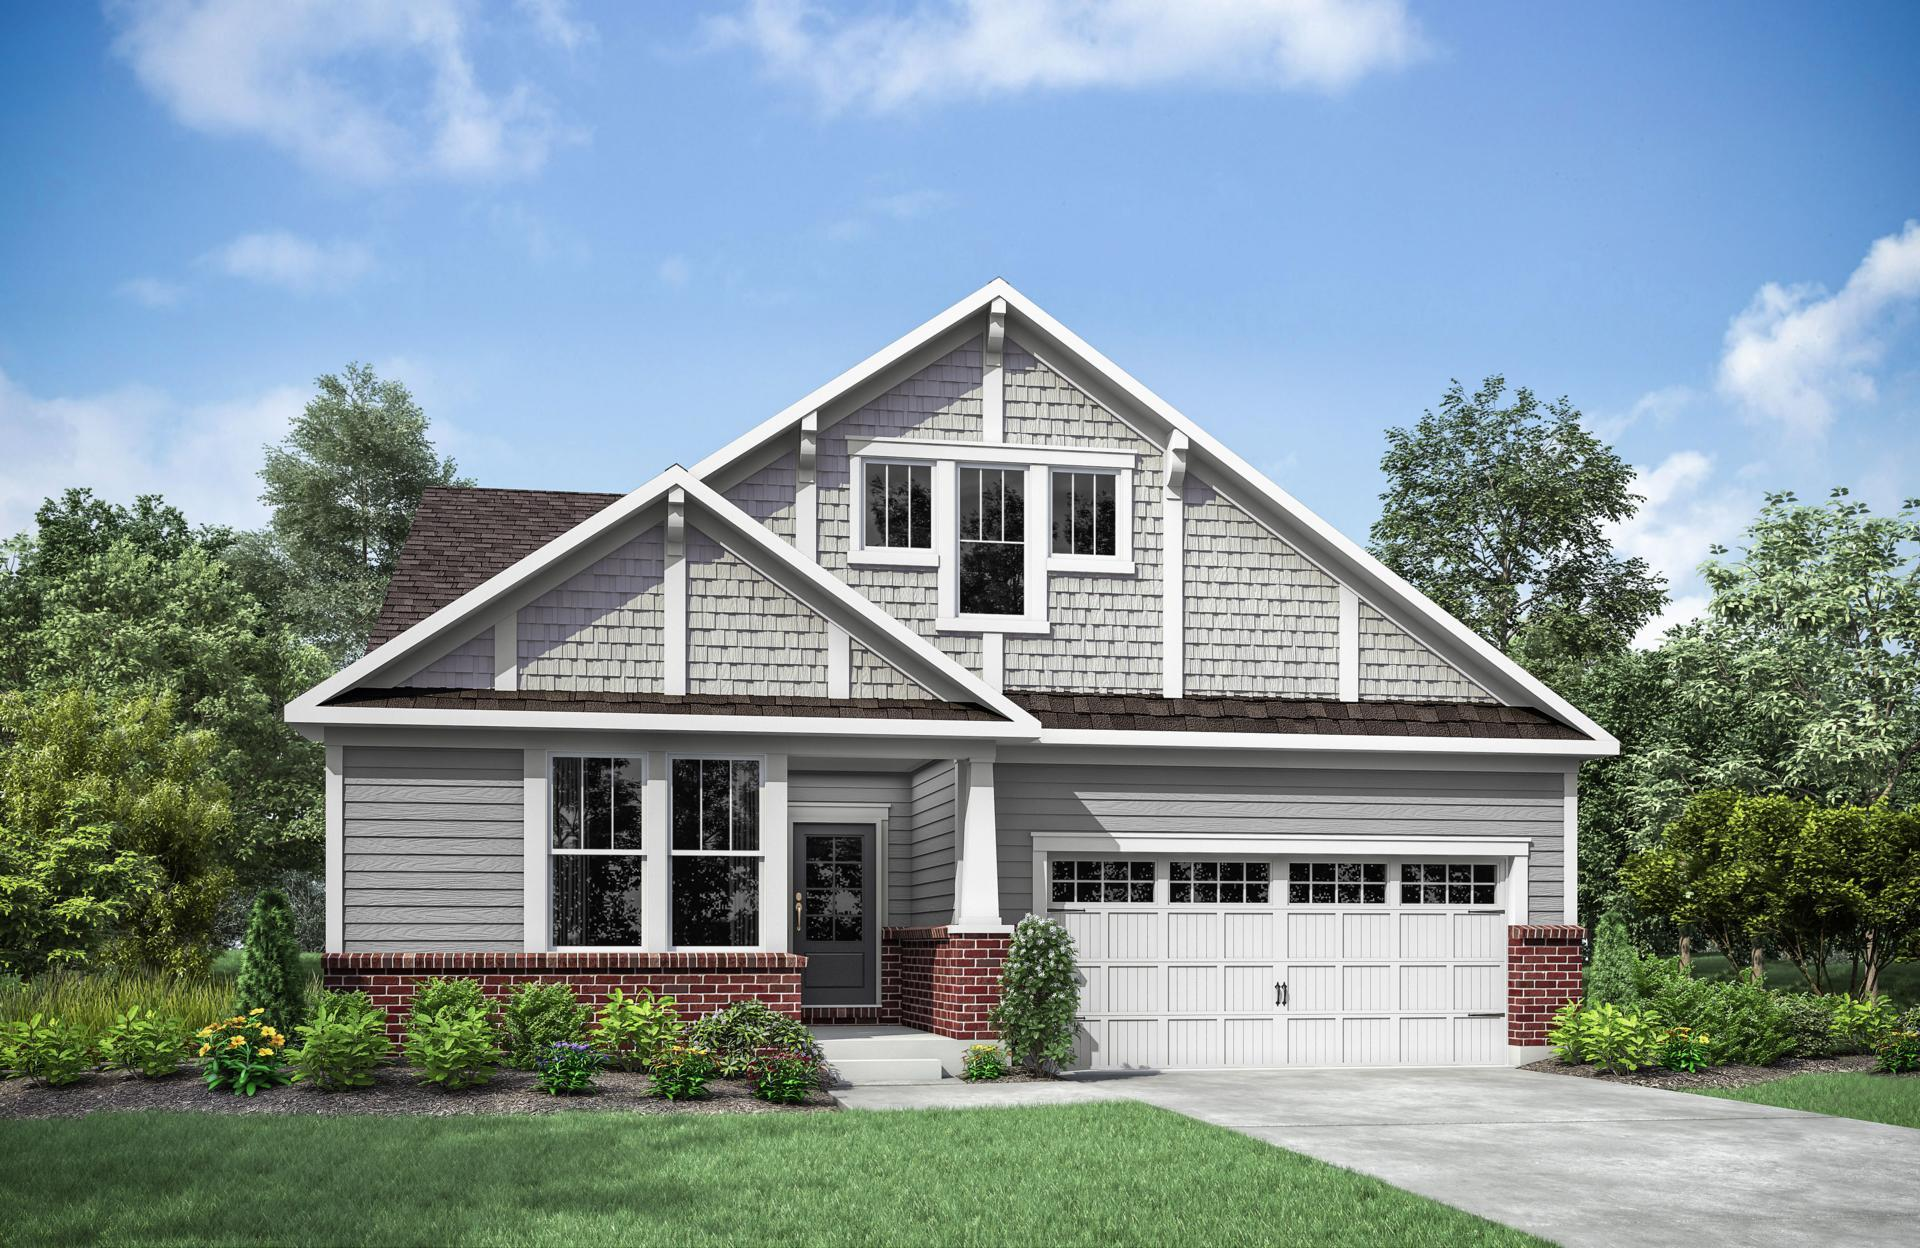 'The Woodlands - Villas' by Drees Homes in Cincinnati